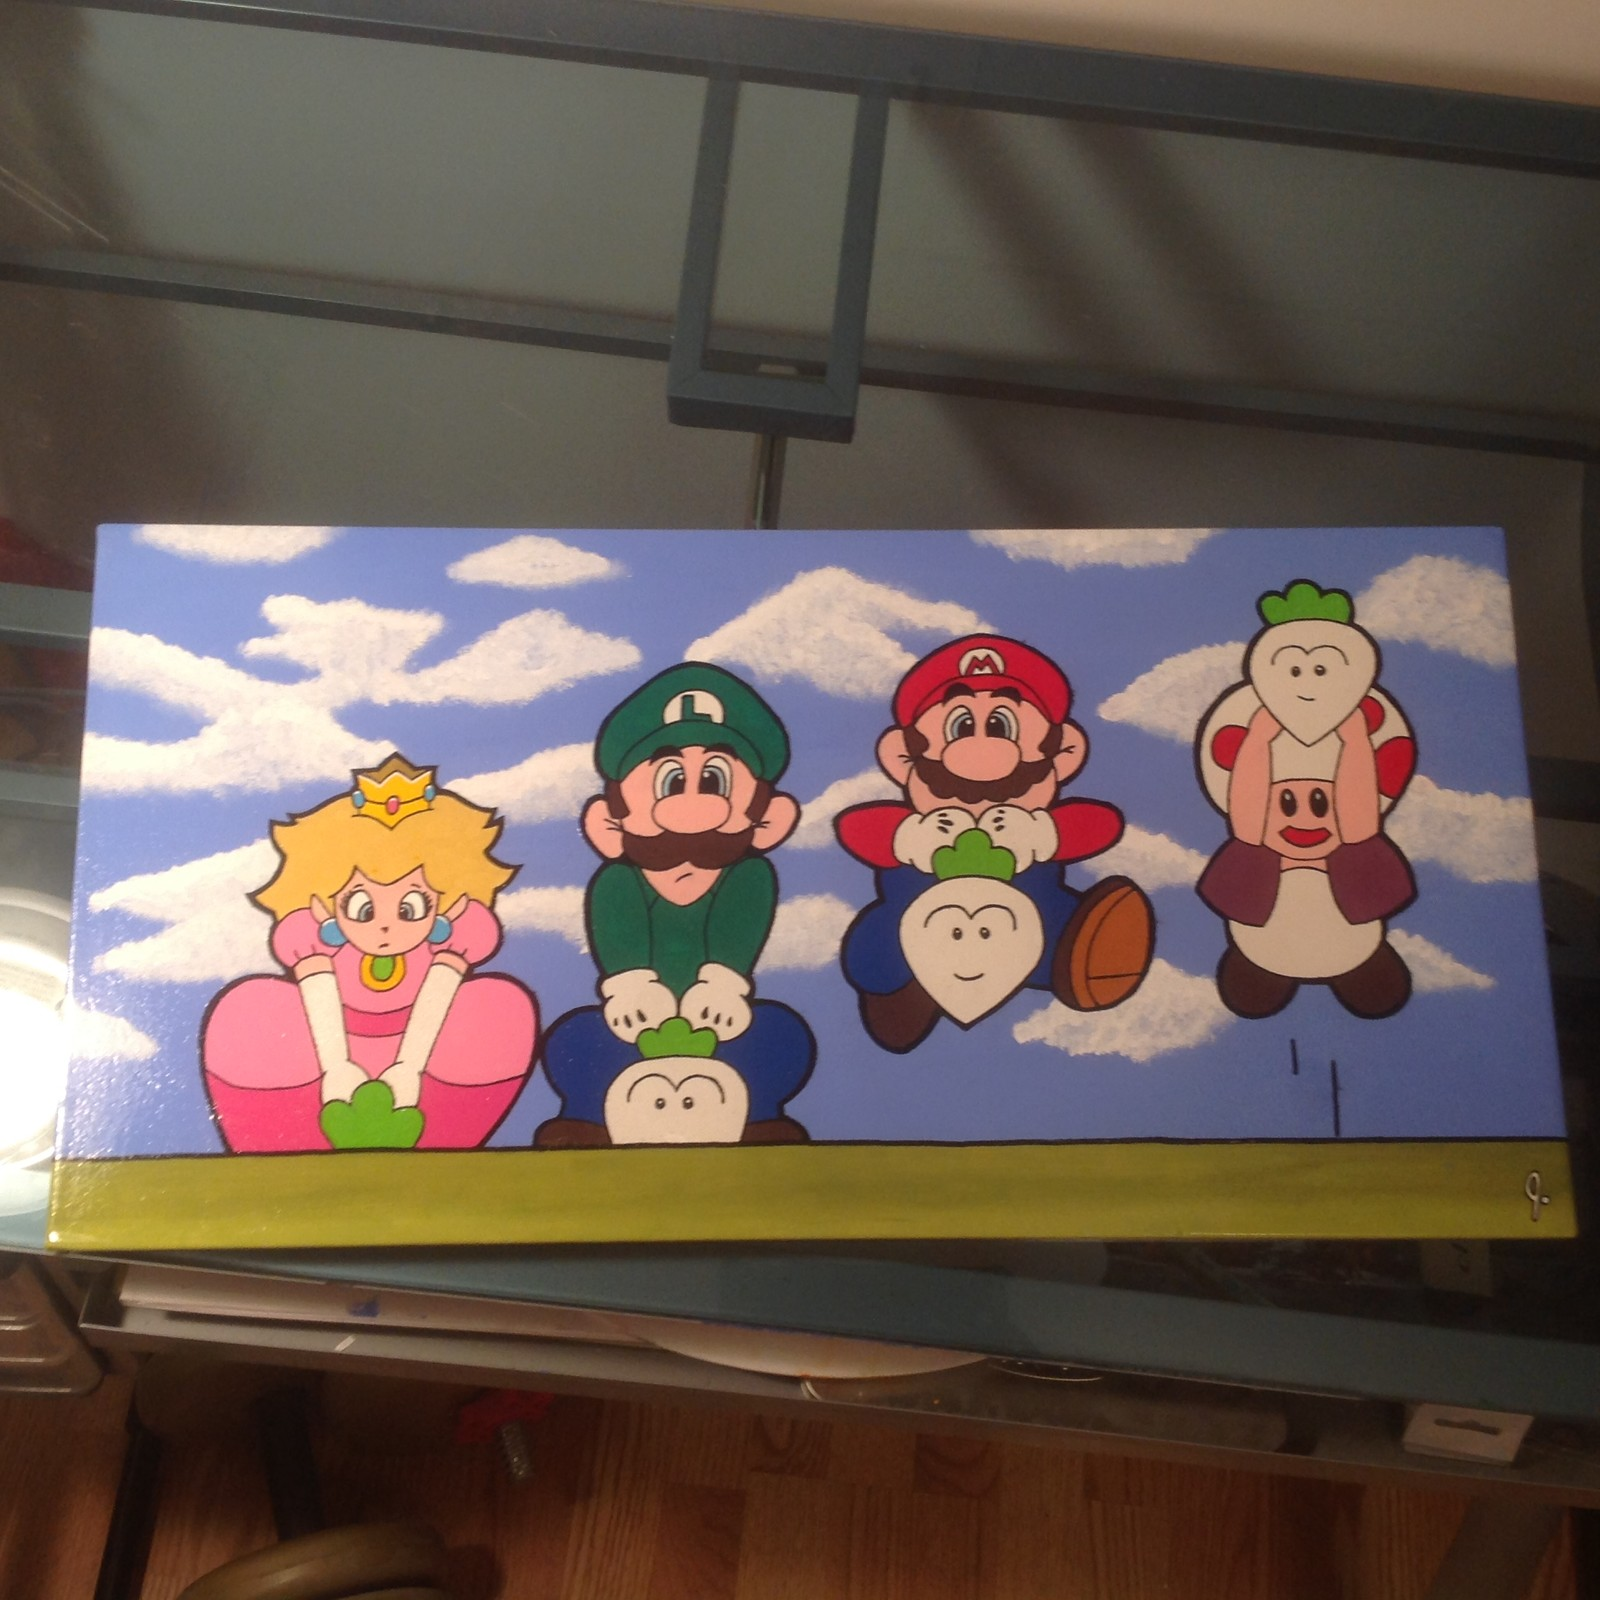 Pluckin' Turnips (Super Mario Bros. 2) 12 x 24 canvas Status: For Sale